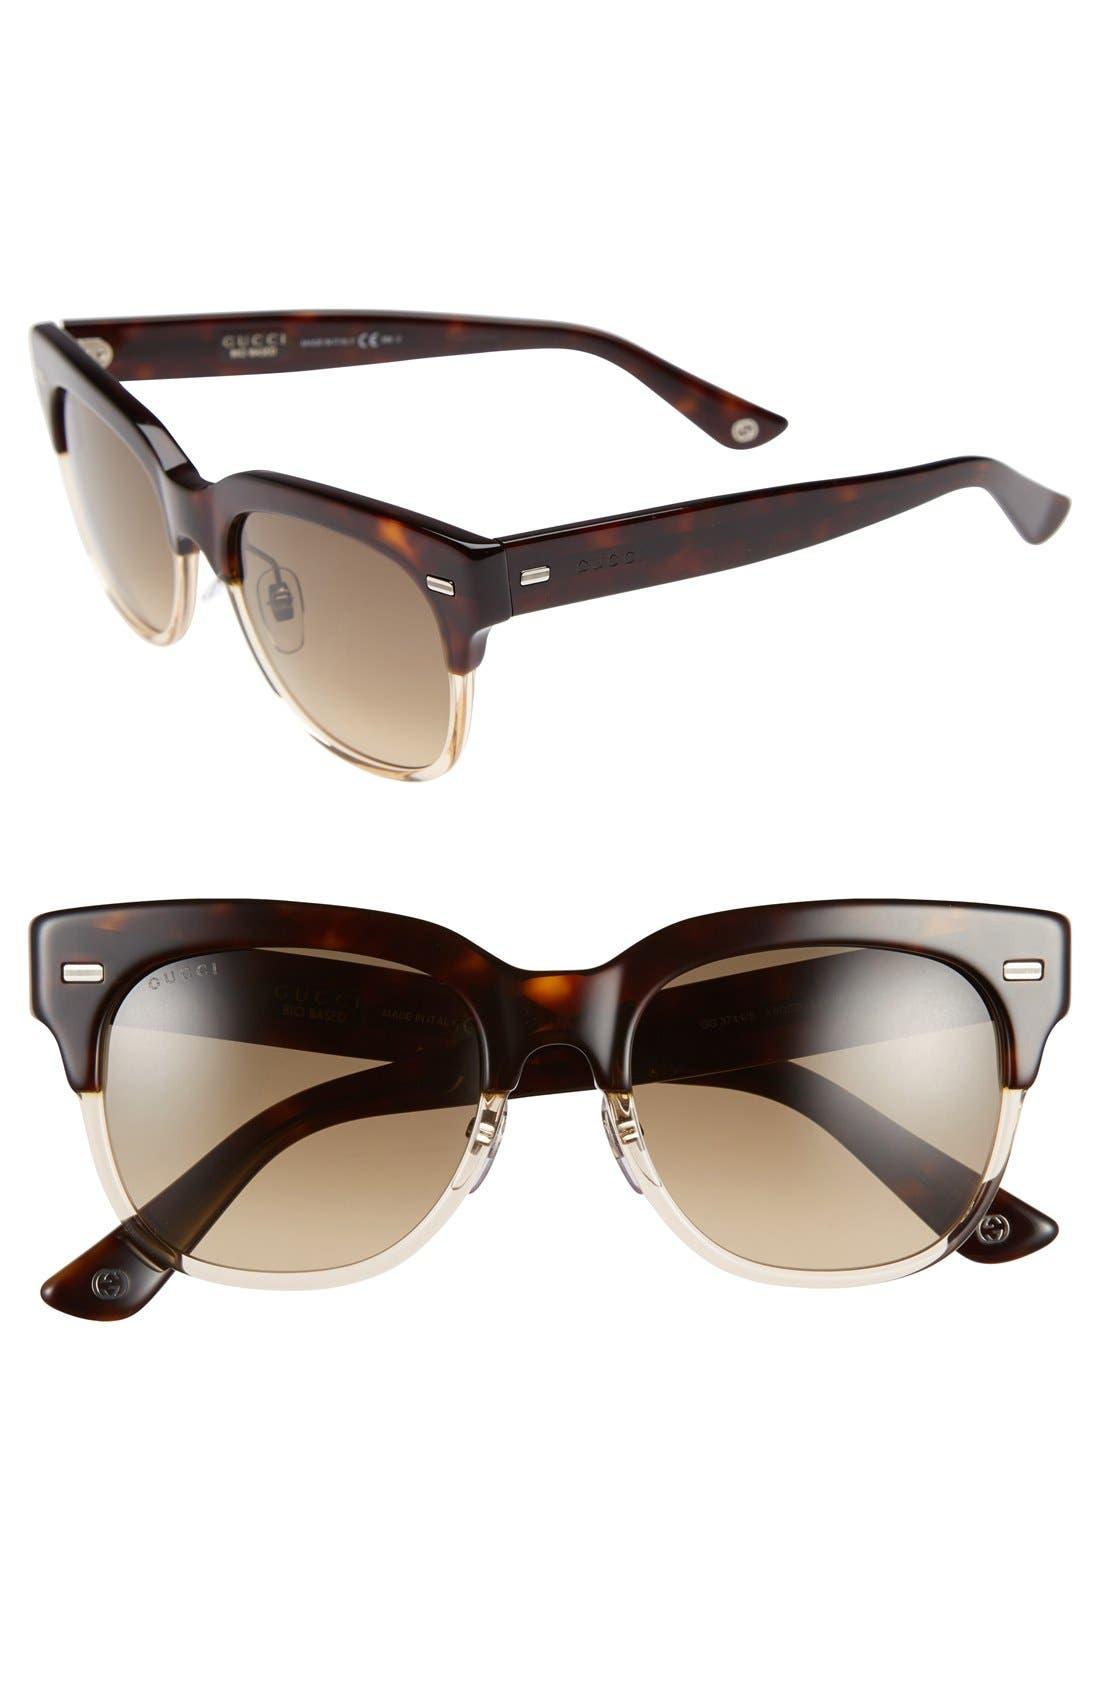 Alternate Image 1 Selected - Gucci 52mm Retro Sunglasses